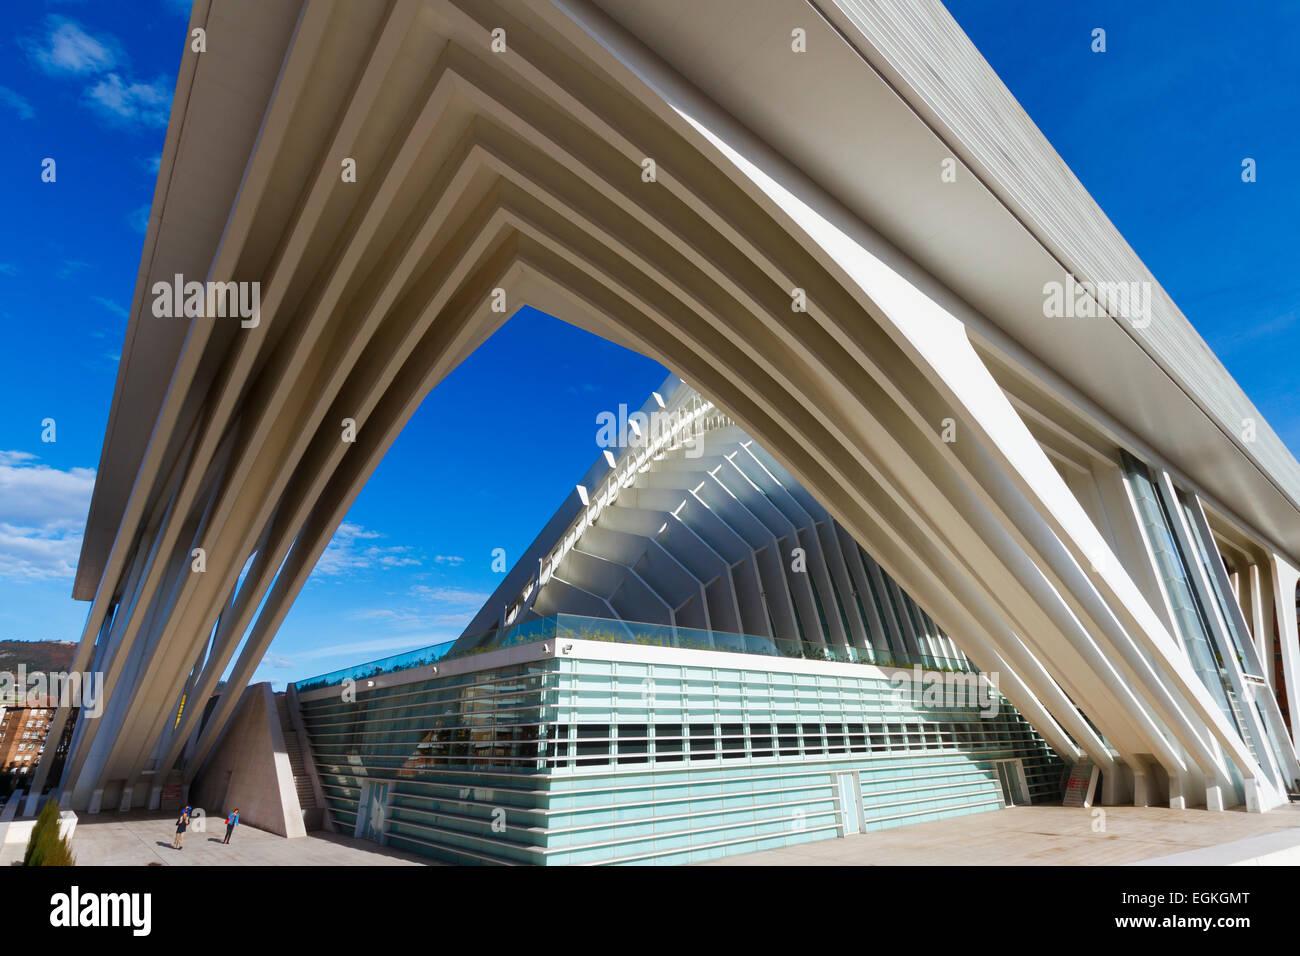 Moderne Architektur Gebaude Stockfoto Bild 79106184 Alamy